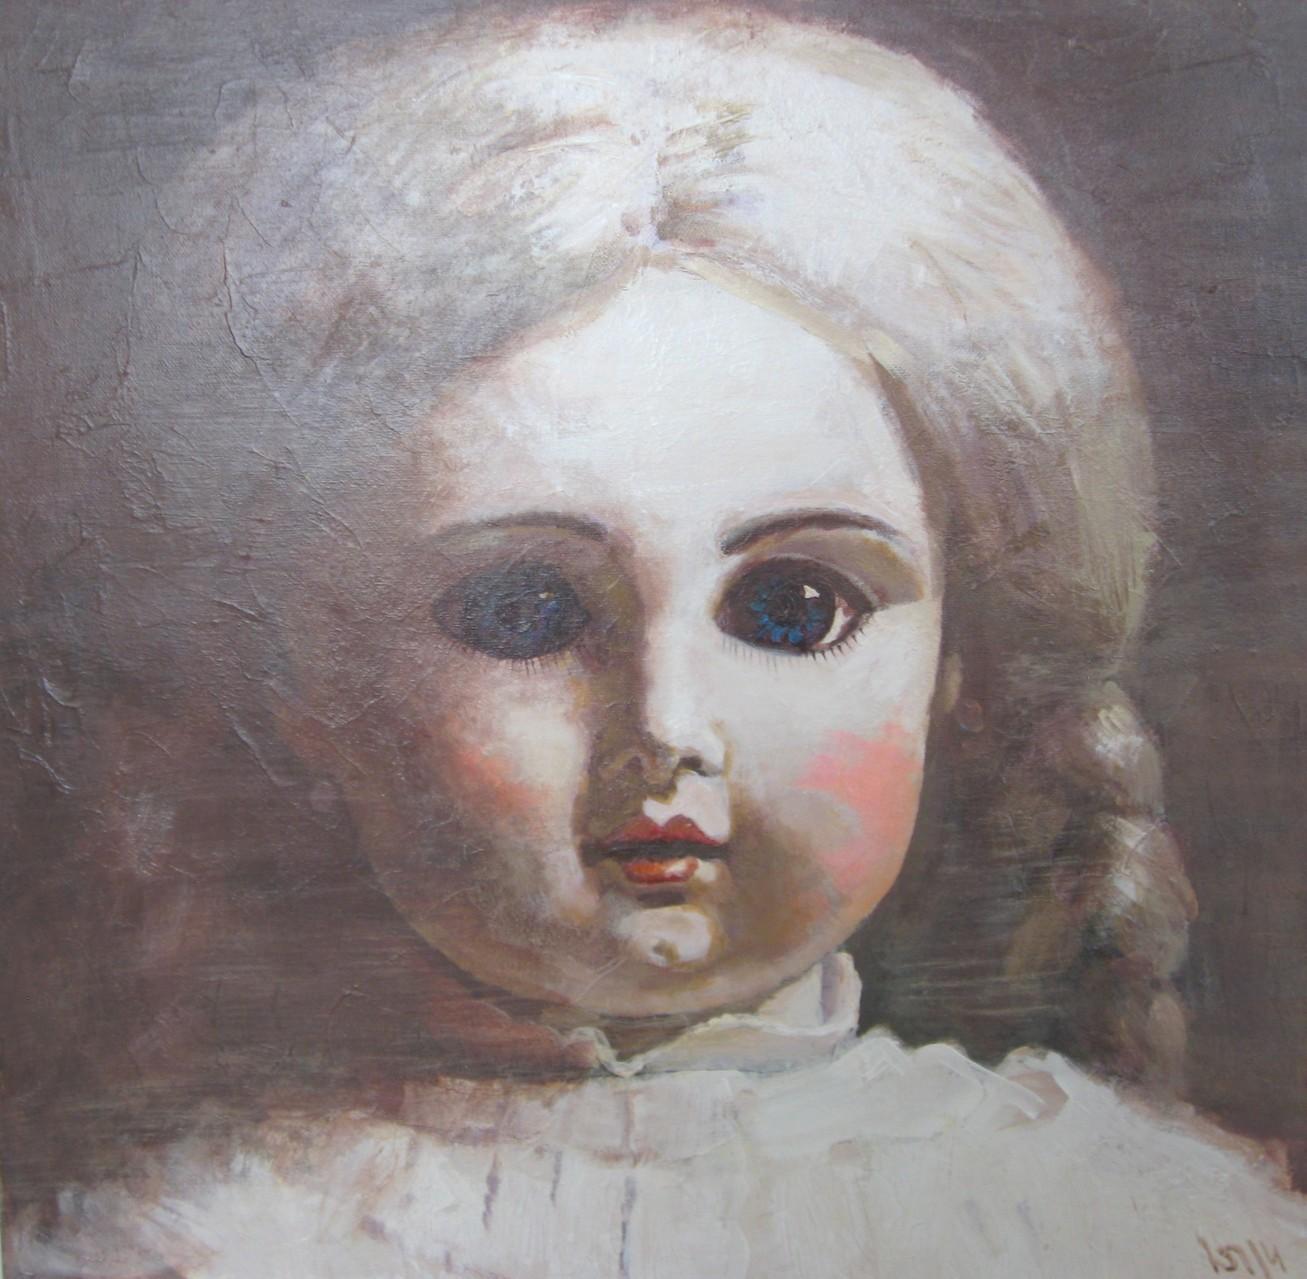 Юрий Первушин.   Кукла 1.   (Сер. «Старинные куклы»).    2014 г.    Холст, акрил.    60х60 см.